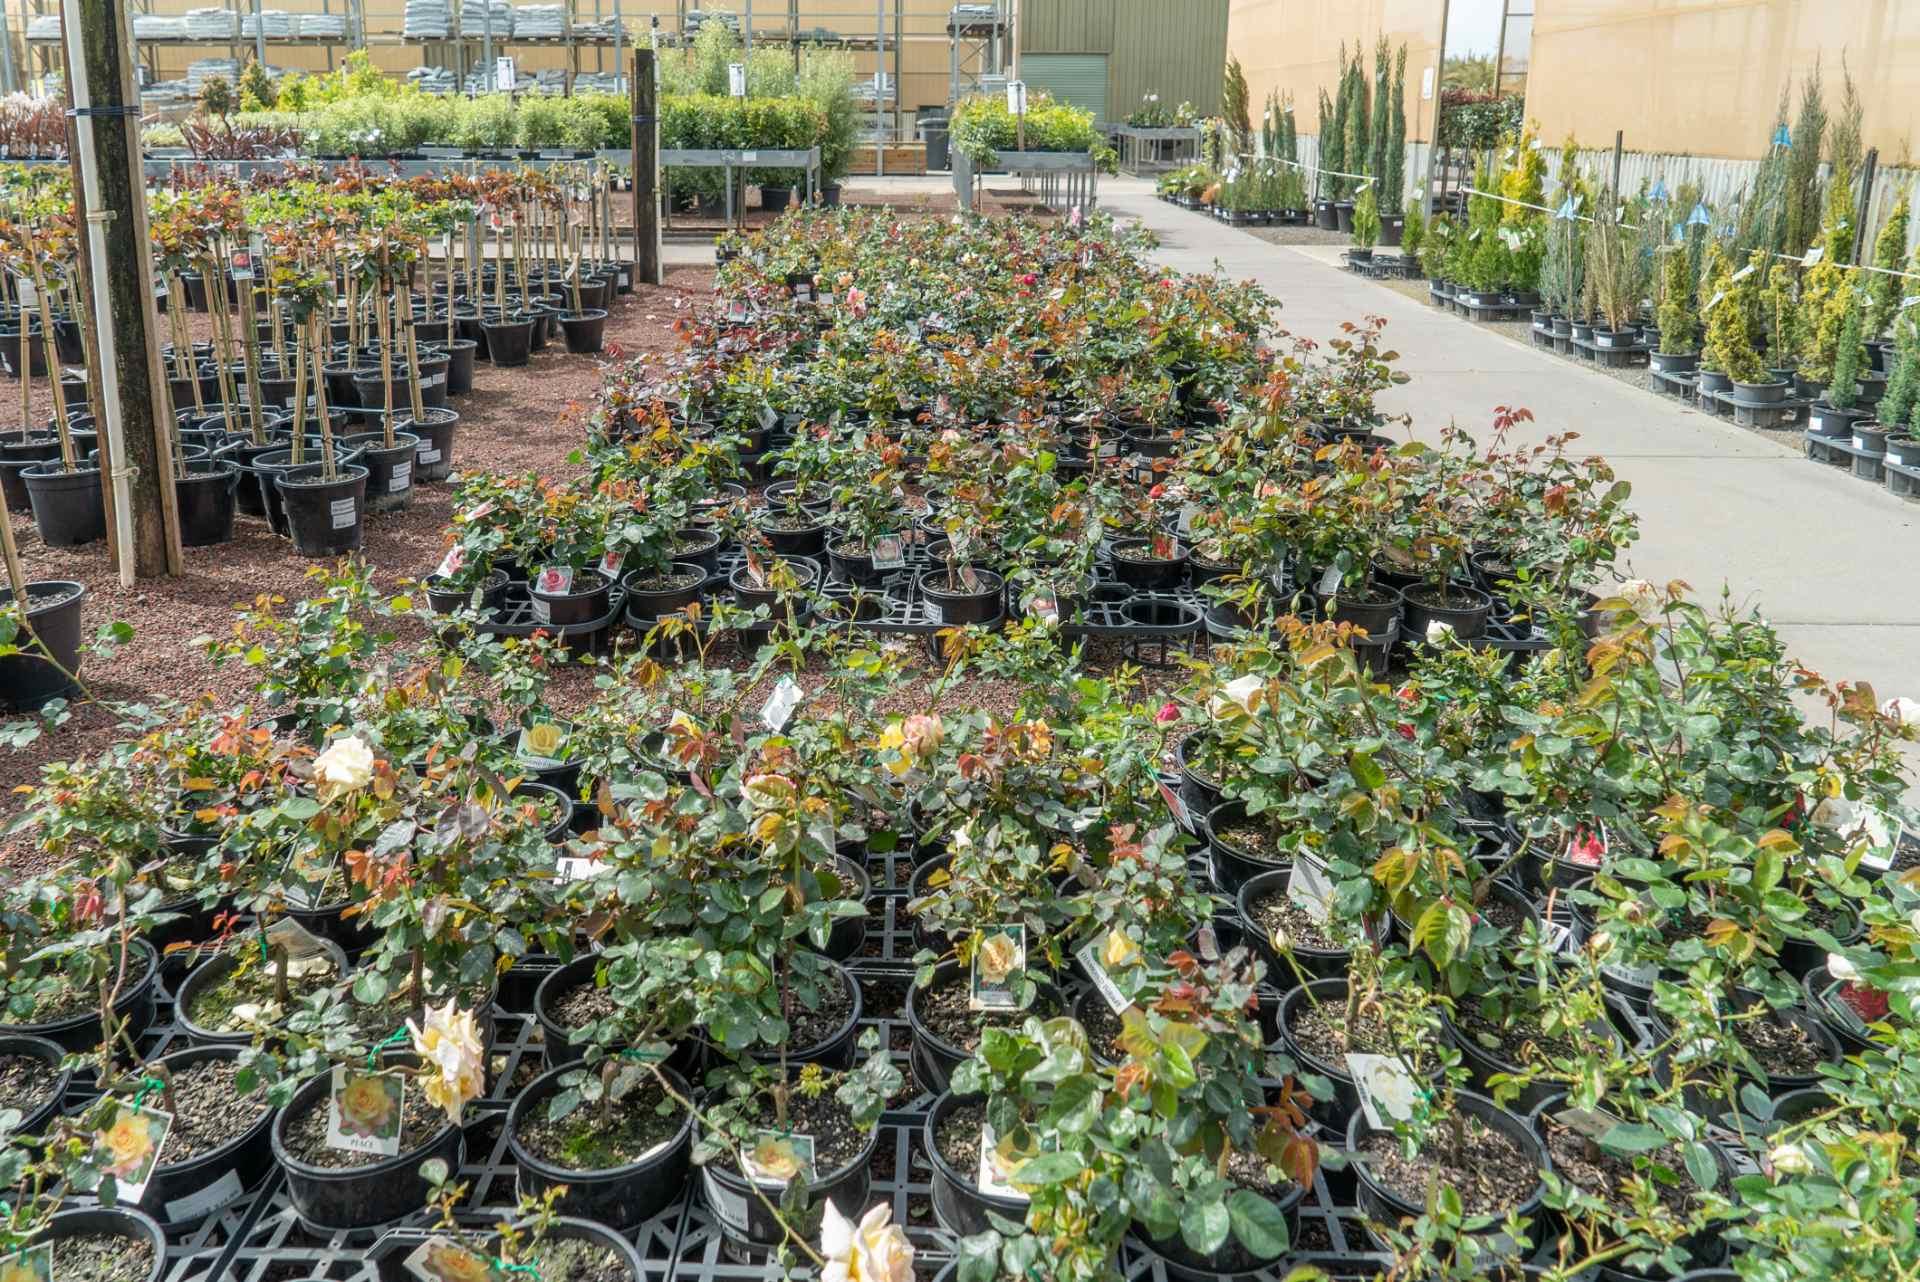 extensive range of native plants